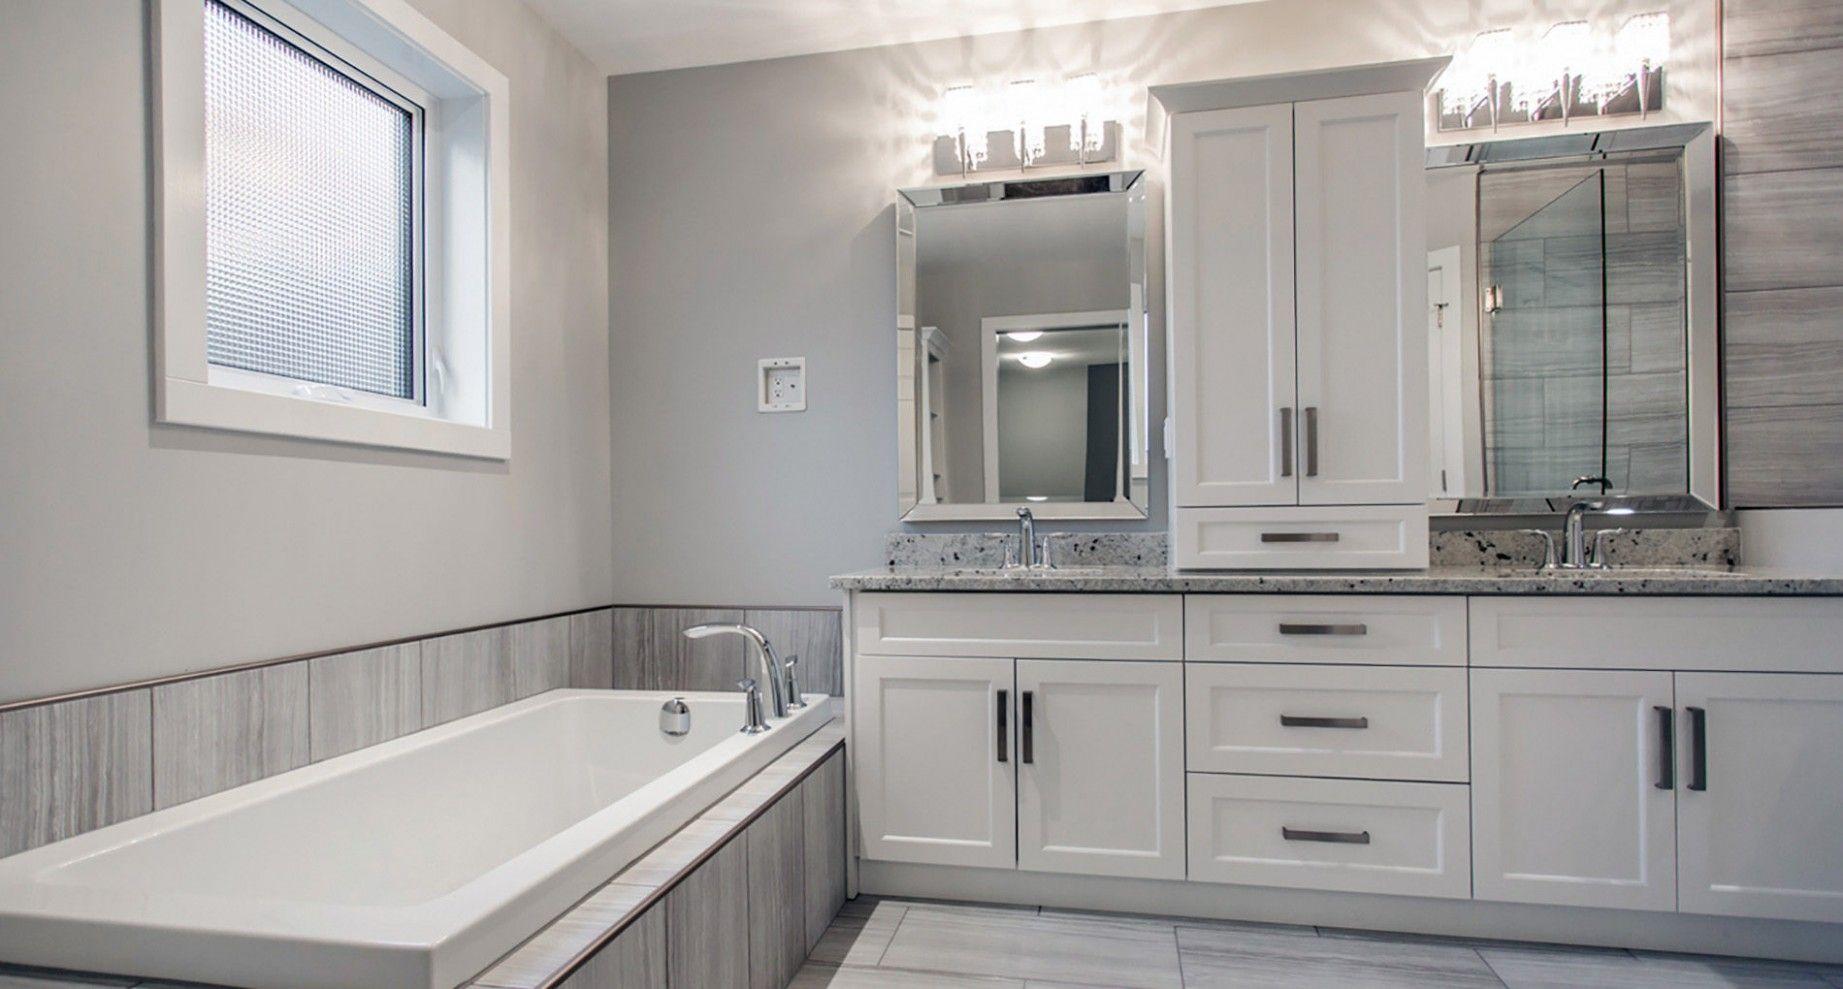 Bathroom Remodeling Ideas For Older Homes di 2020